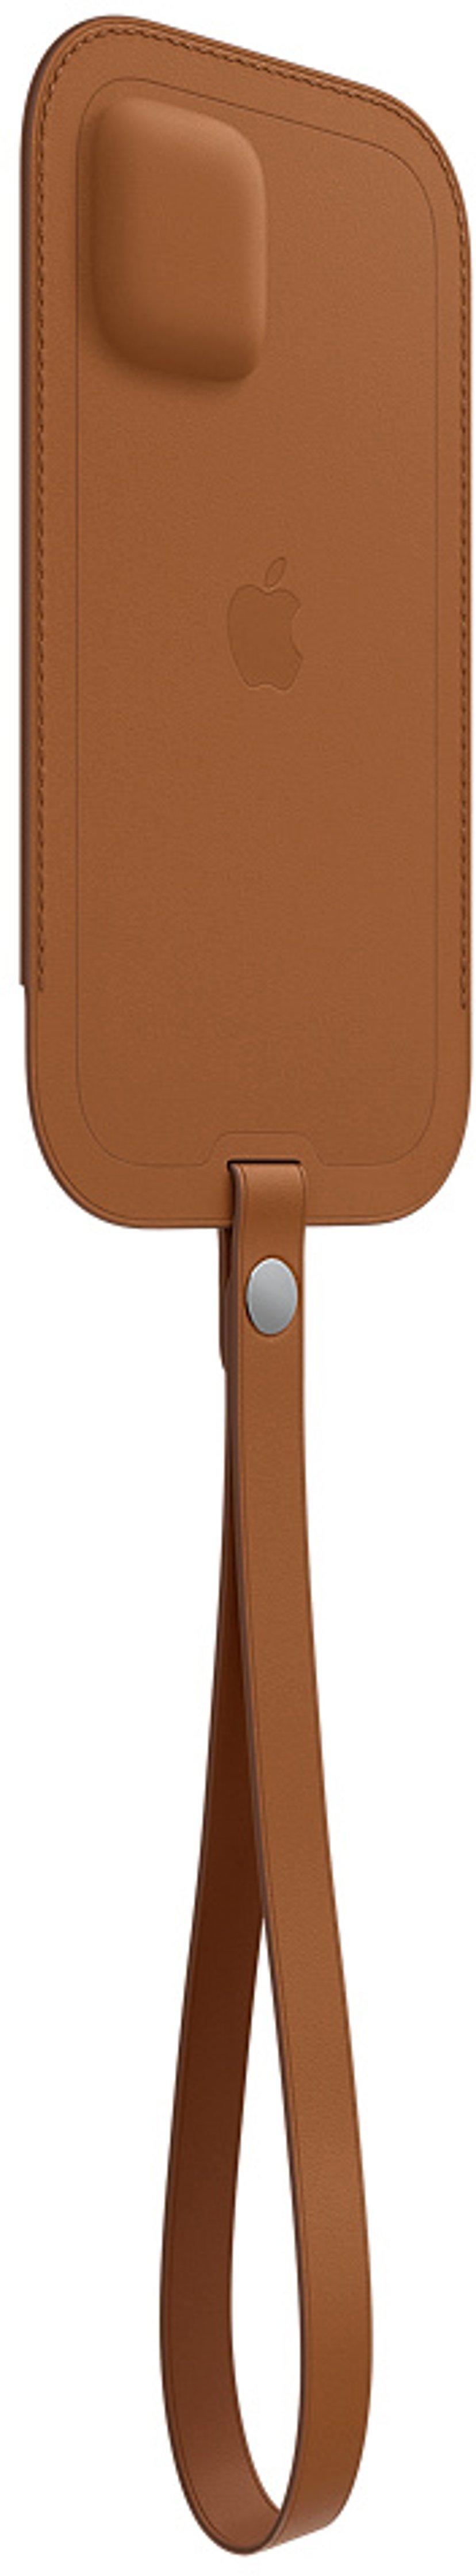 Apple Sleeve with MagSafe iPhone 12 Pro, iPhone 12 Sadelbrun